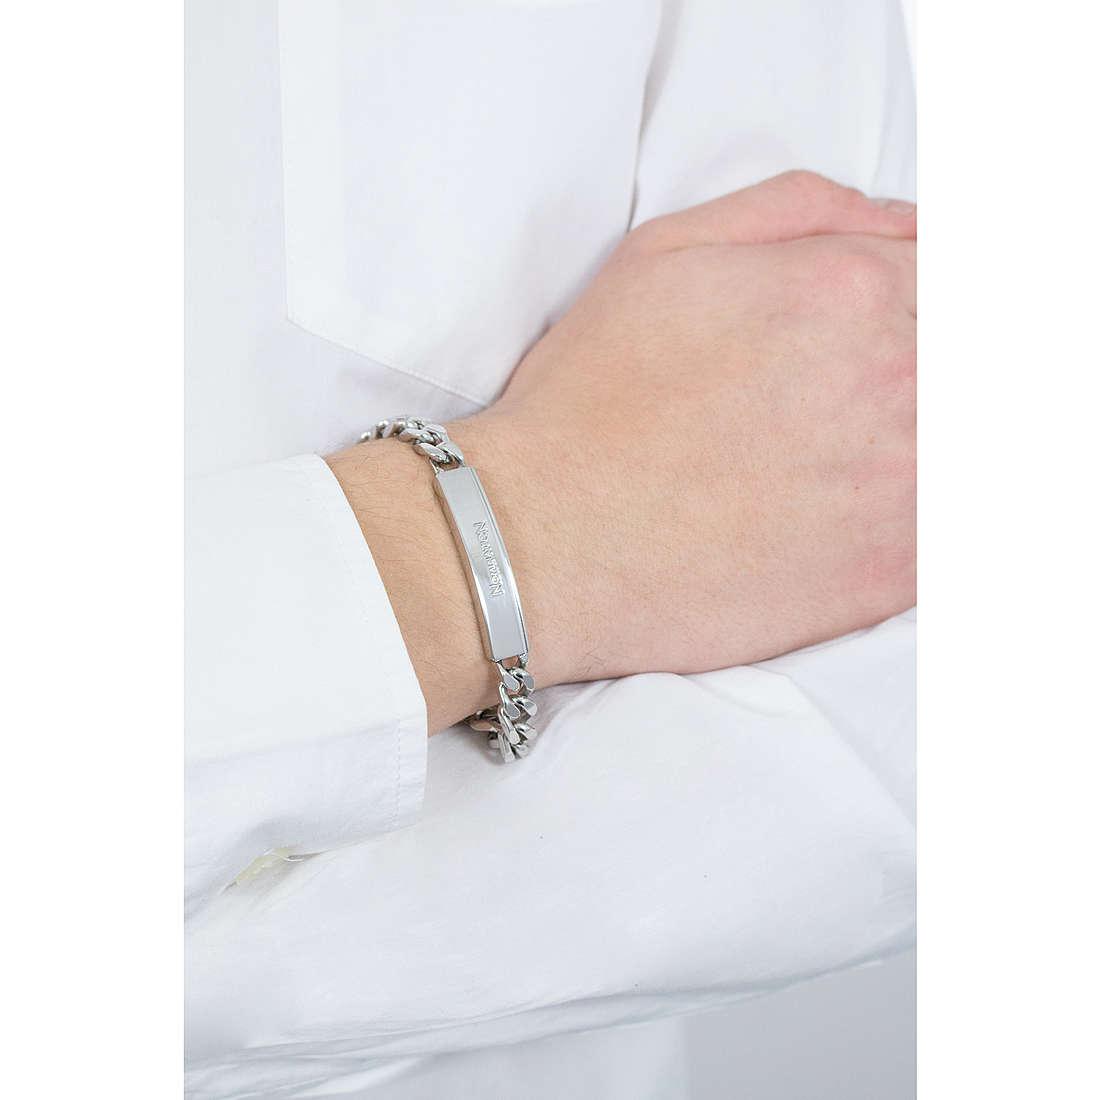 Nomination bracelets Bond homme 021928/005 photo wearing